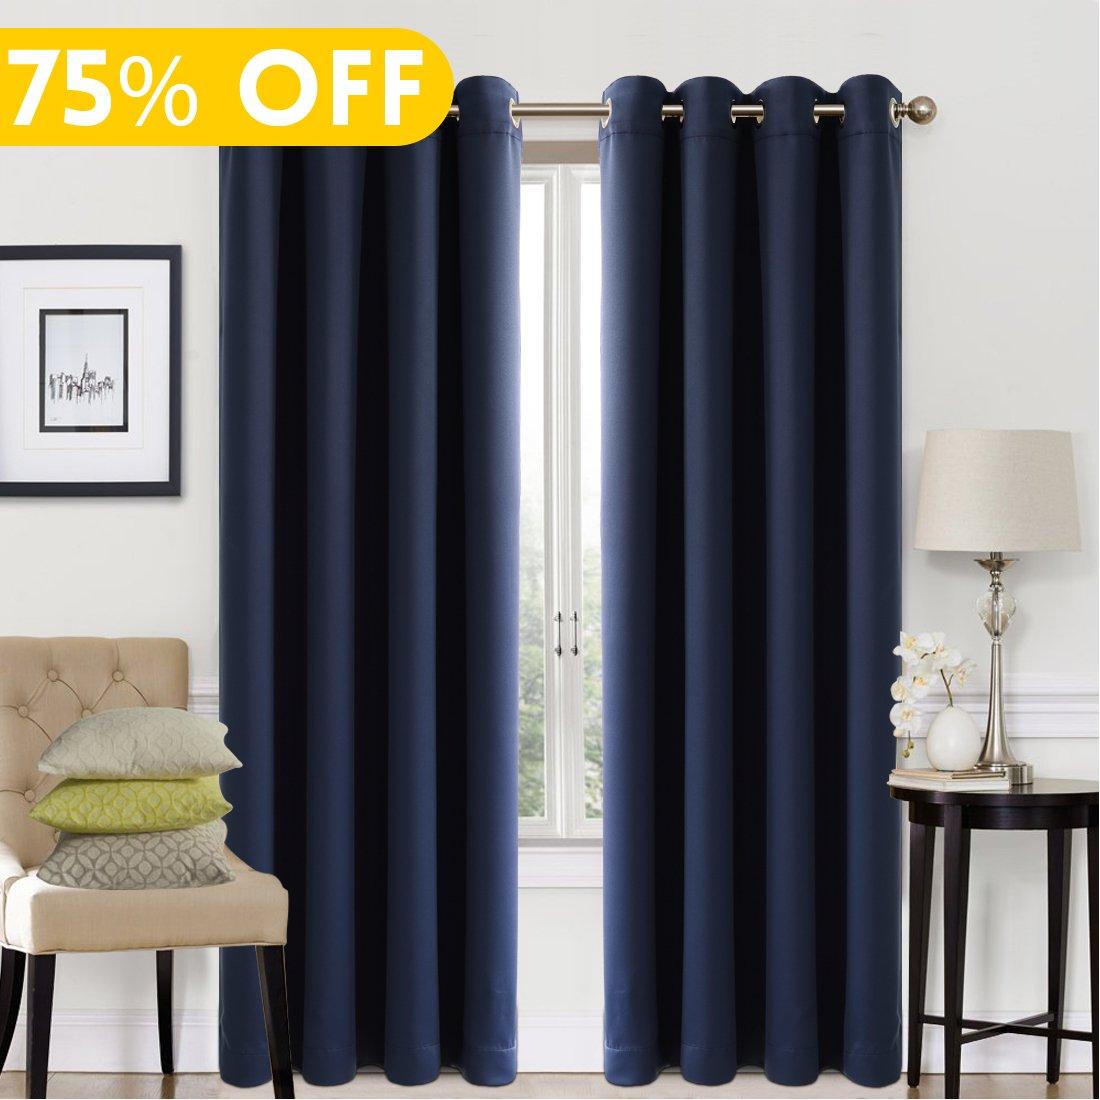 Blackout Window Curtain Panel Grommet Top Drapes 2 Panel Set Room Darkening